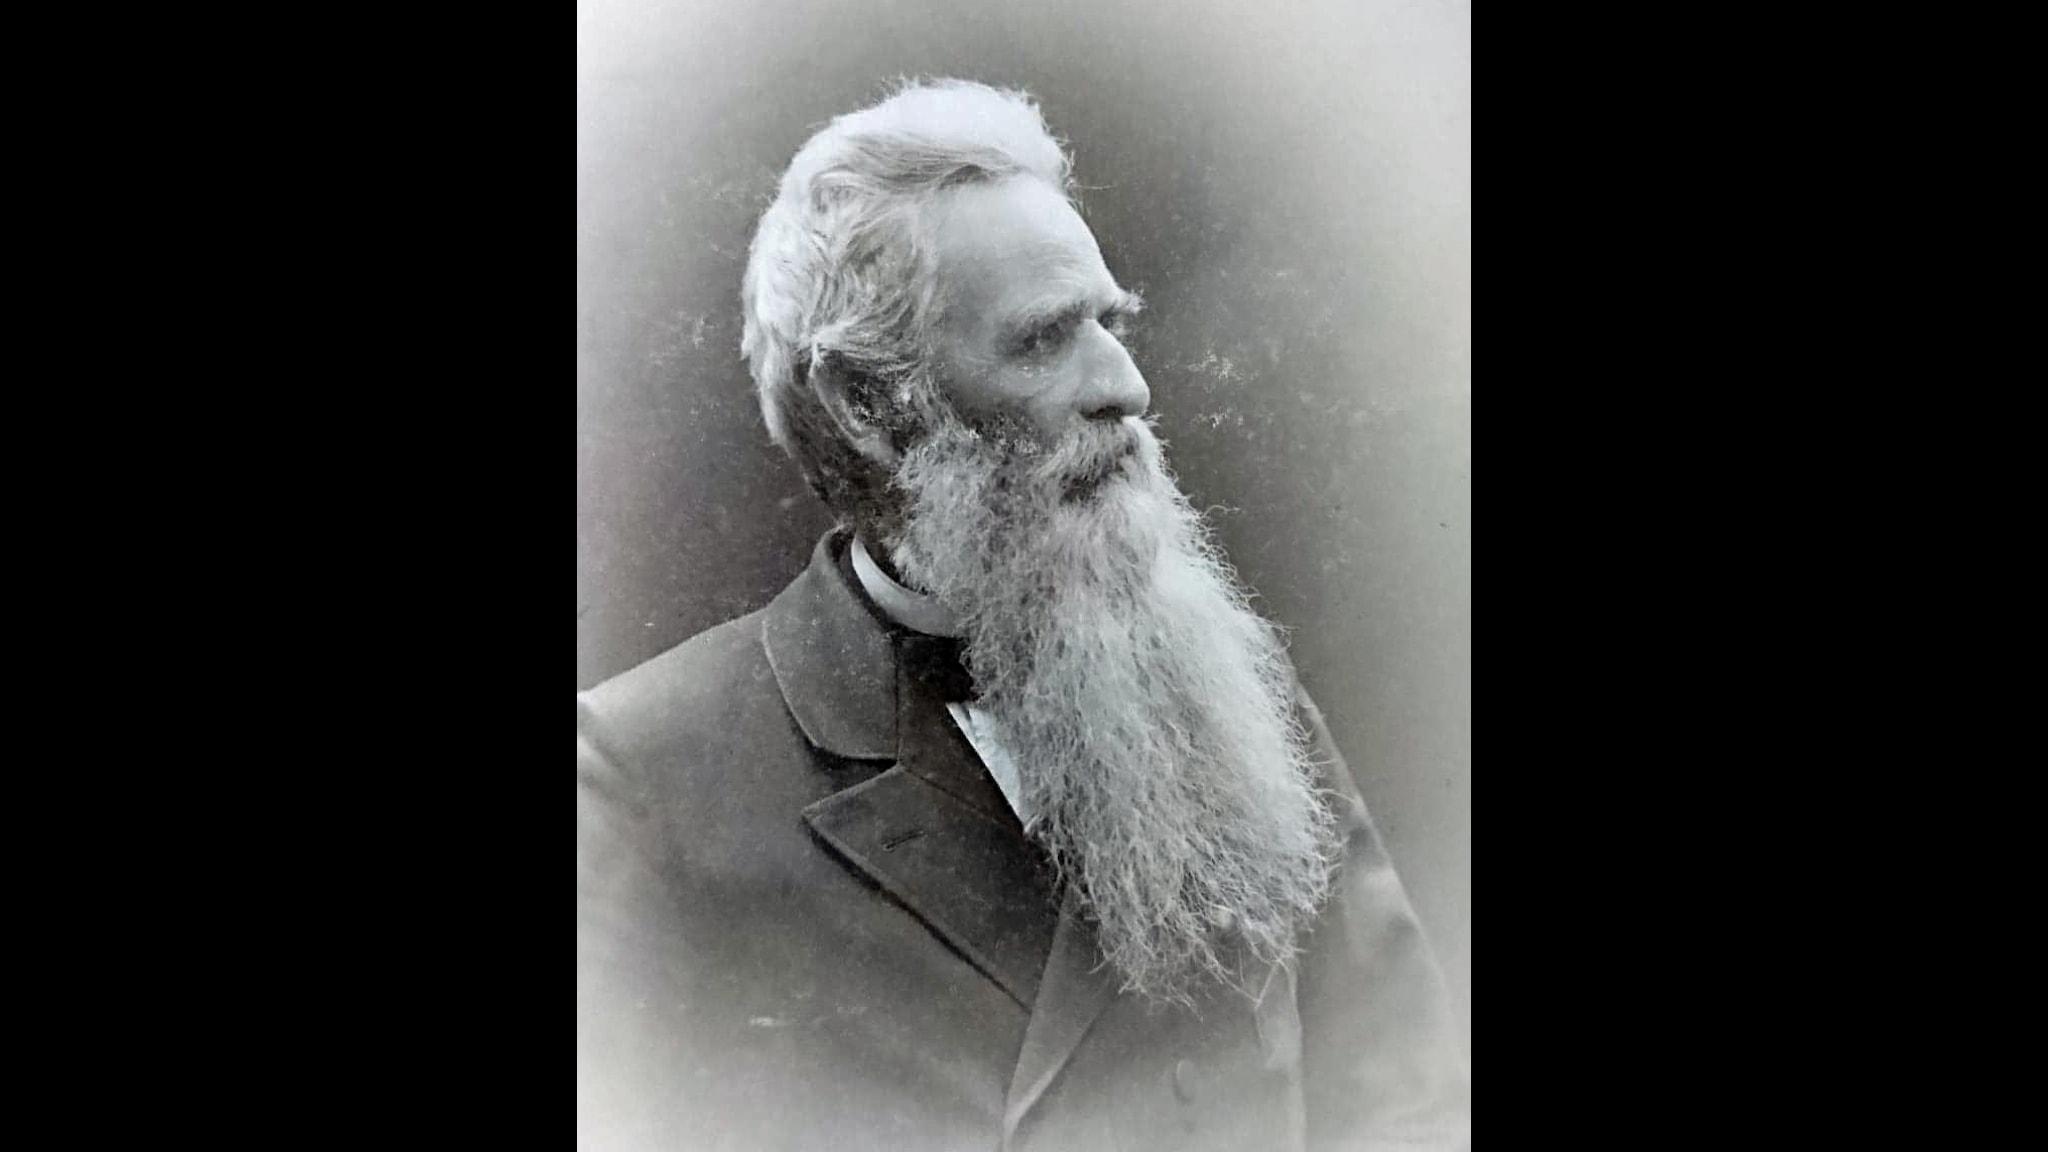 Kristian Torin